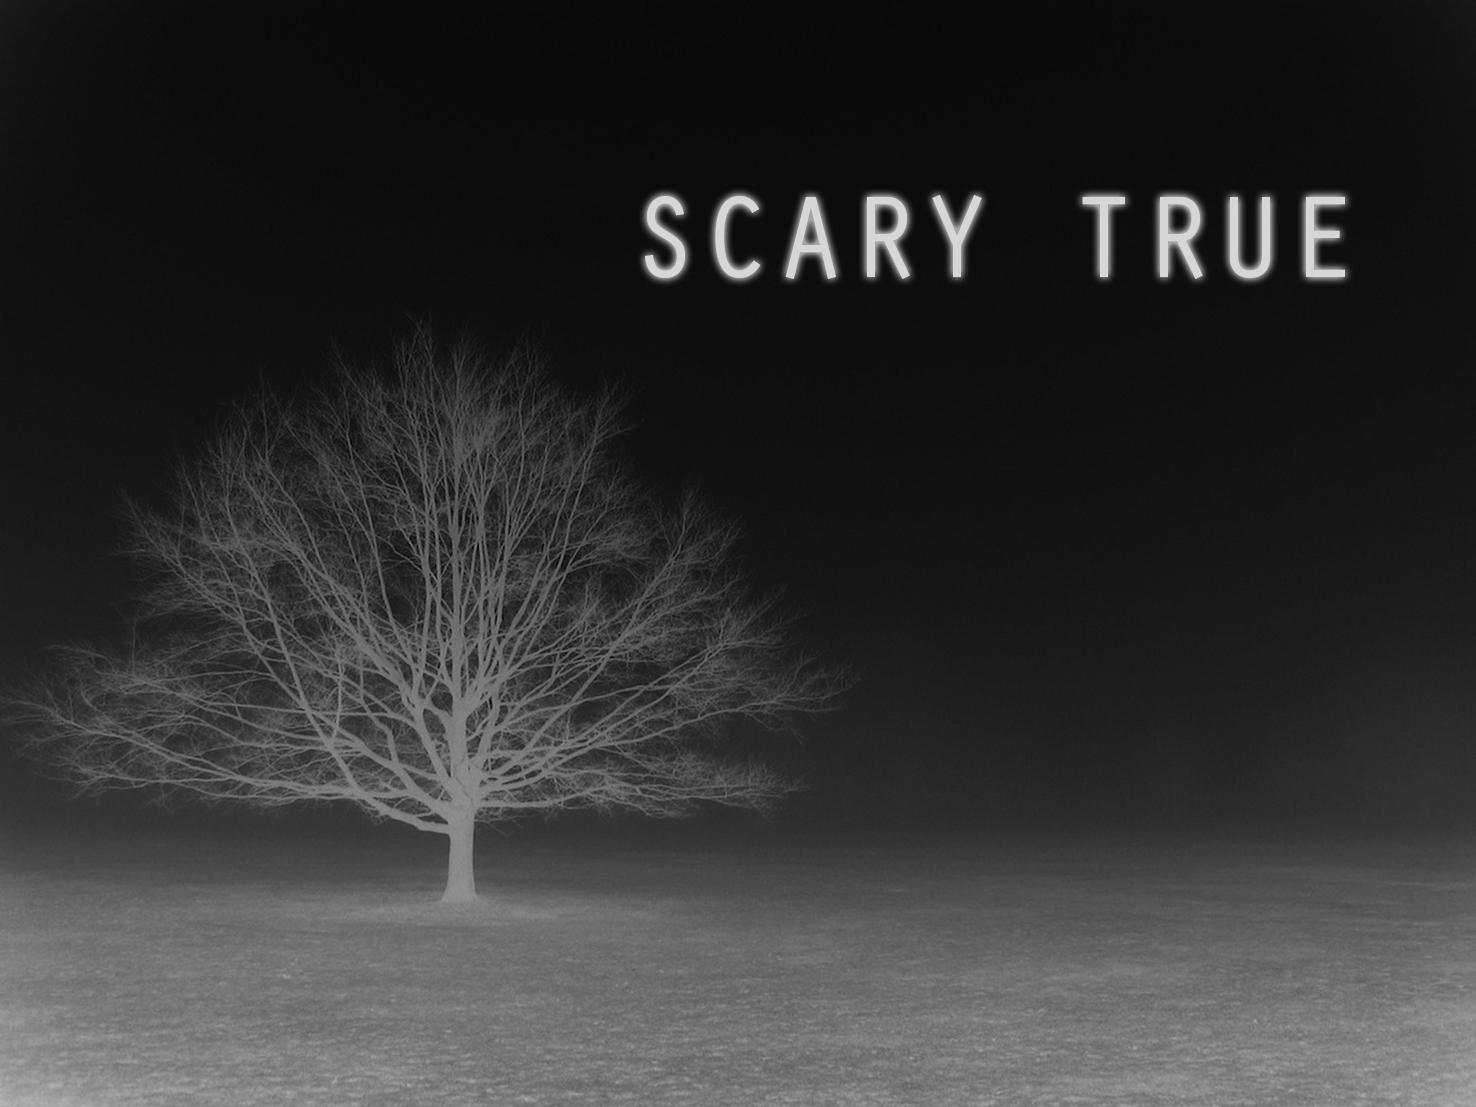 Scary True